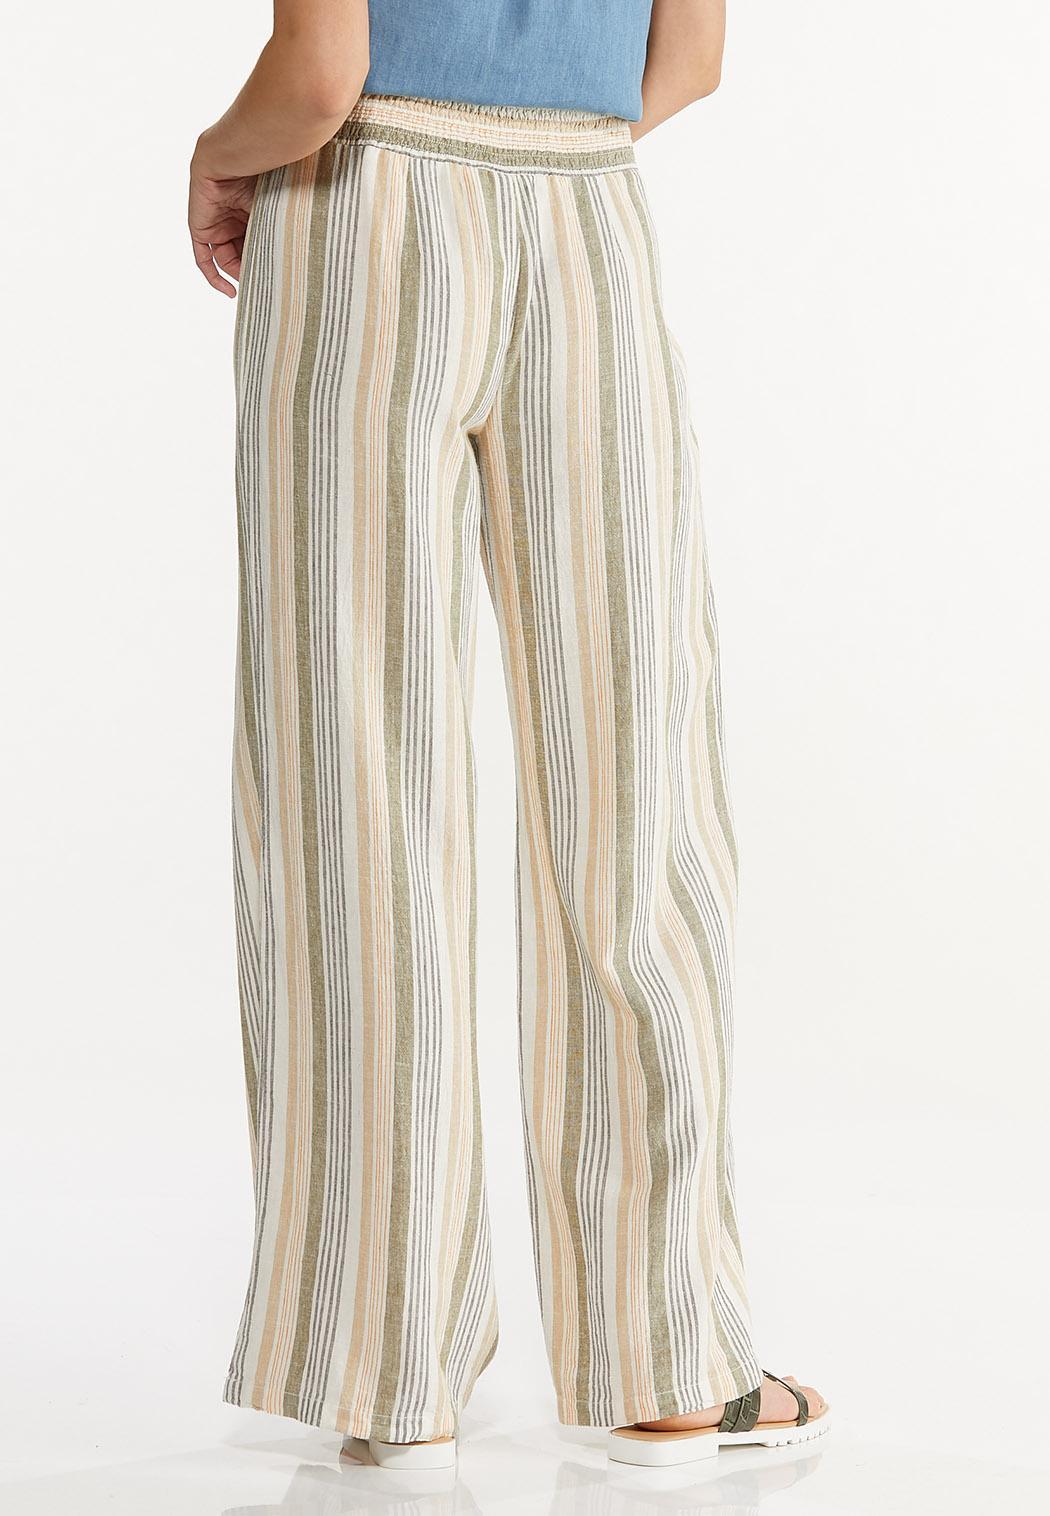 Striped Linen Palazzo Pants (Item #44589701)